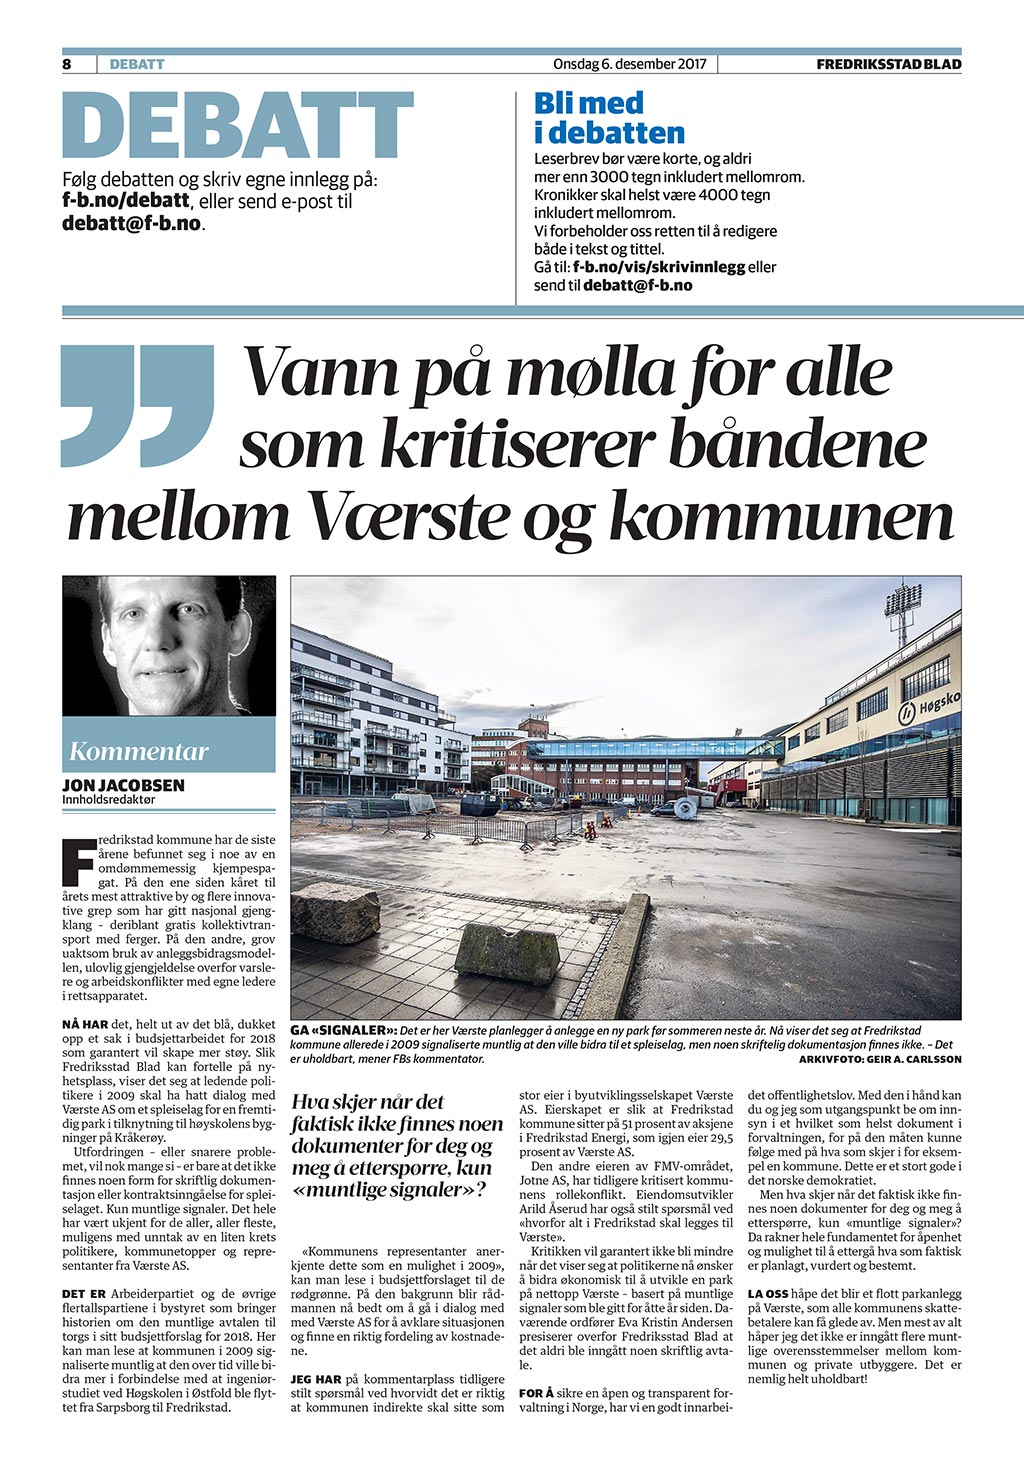 2017-12-06-FB,-Politikergave-etter-løfte-i-2009-3.jpg